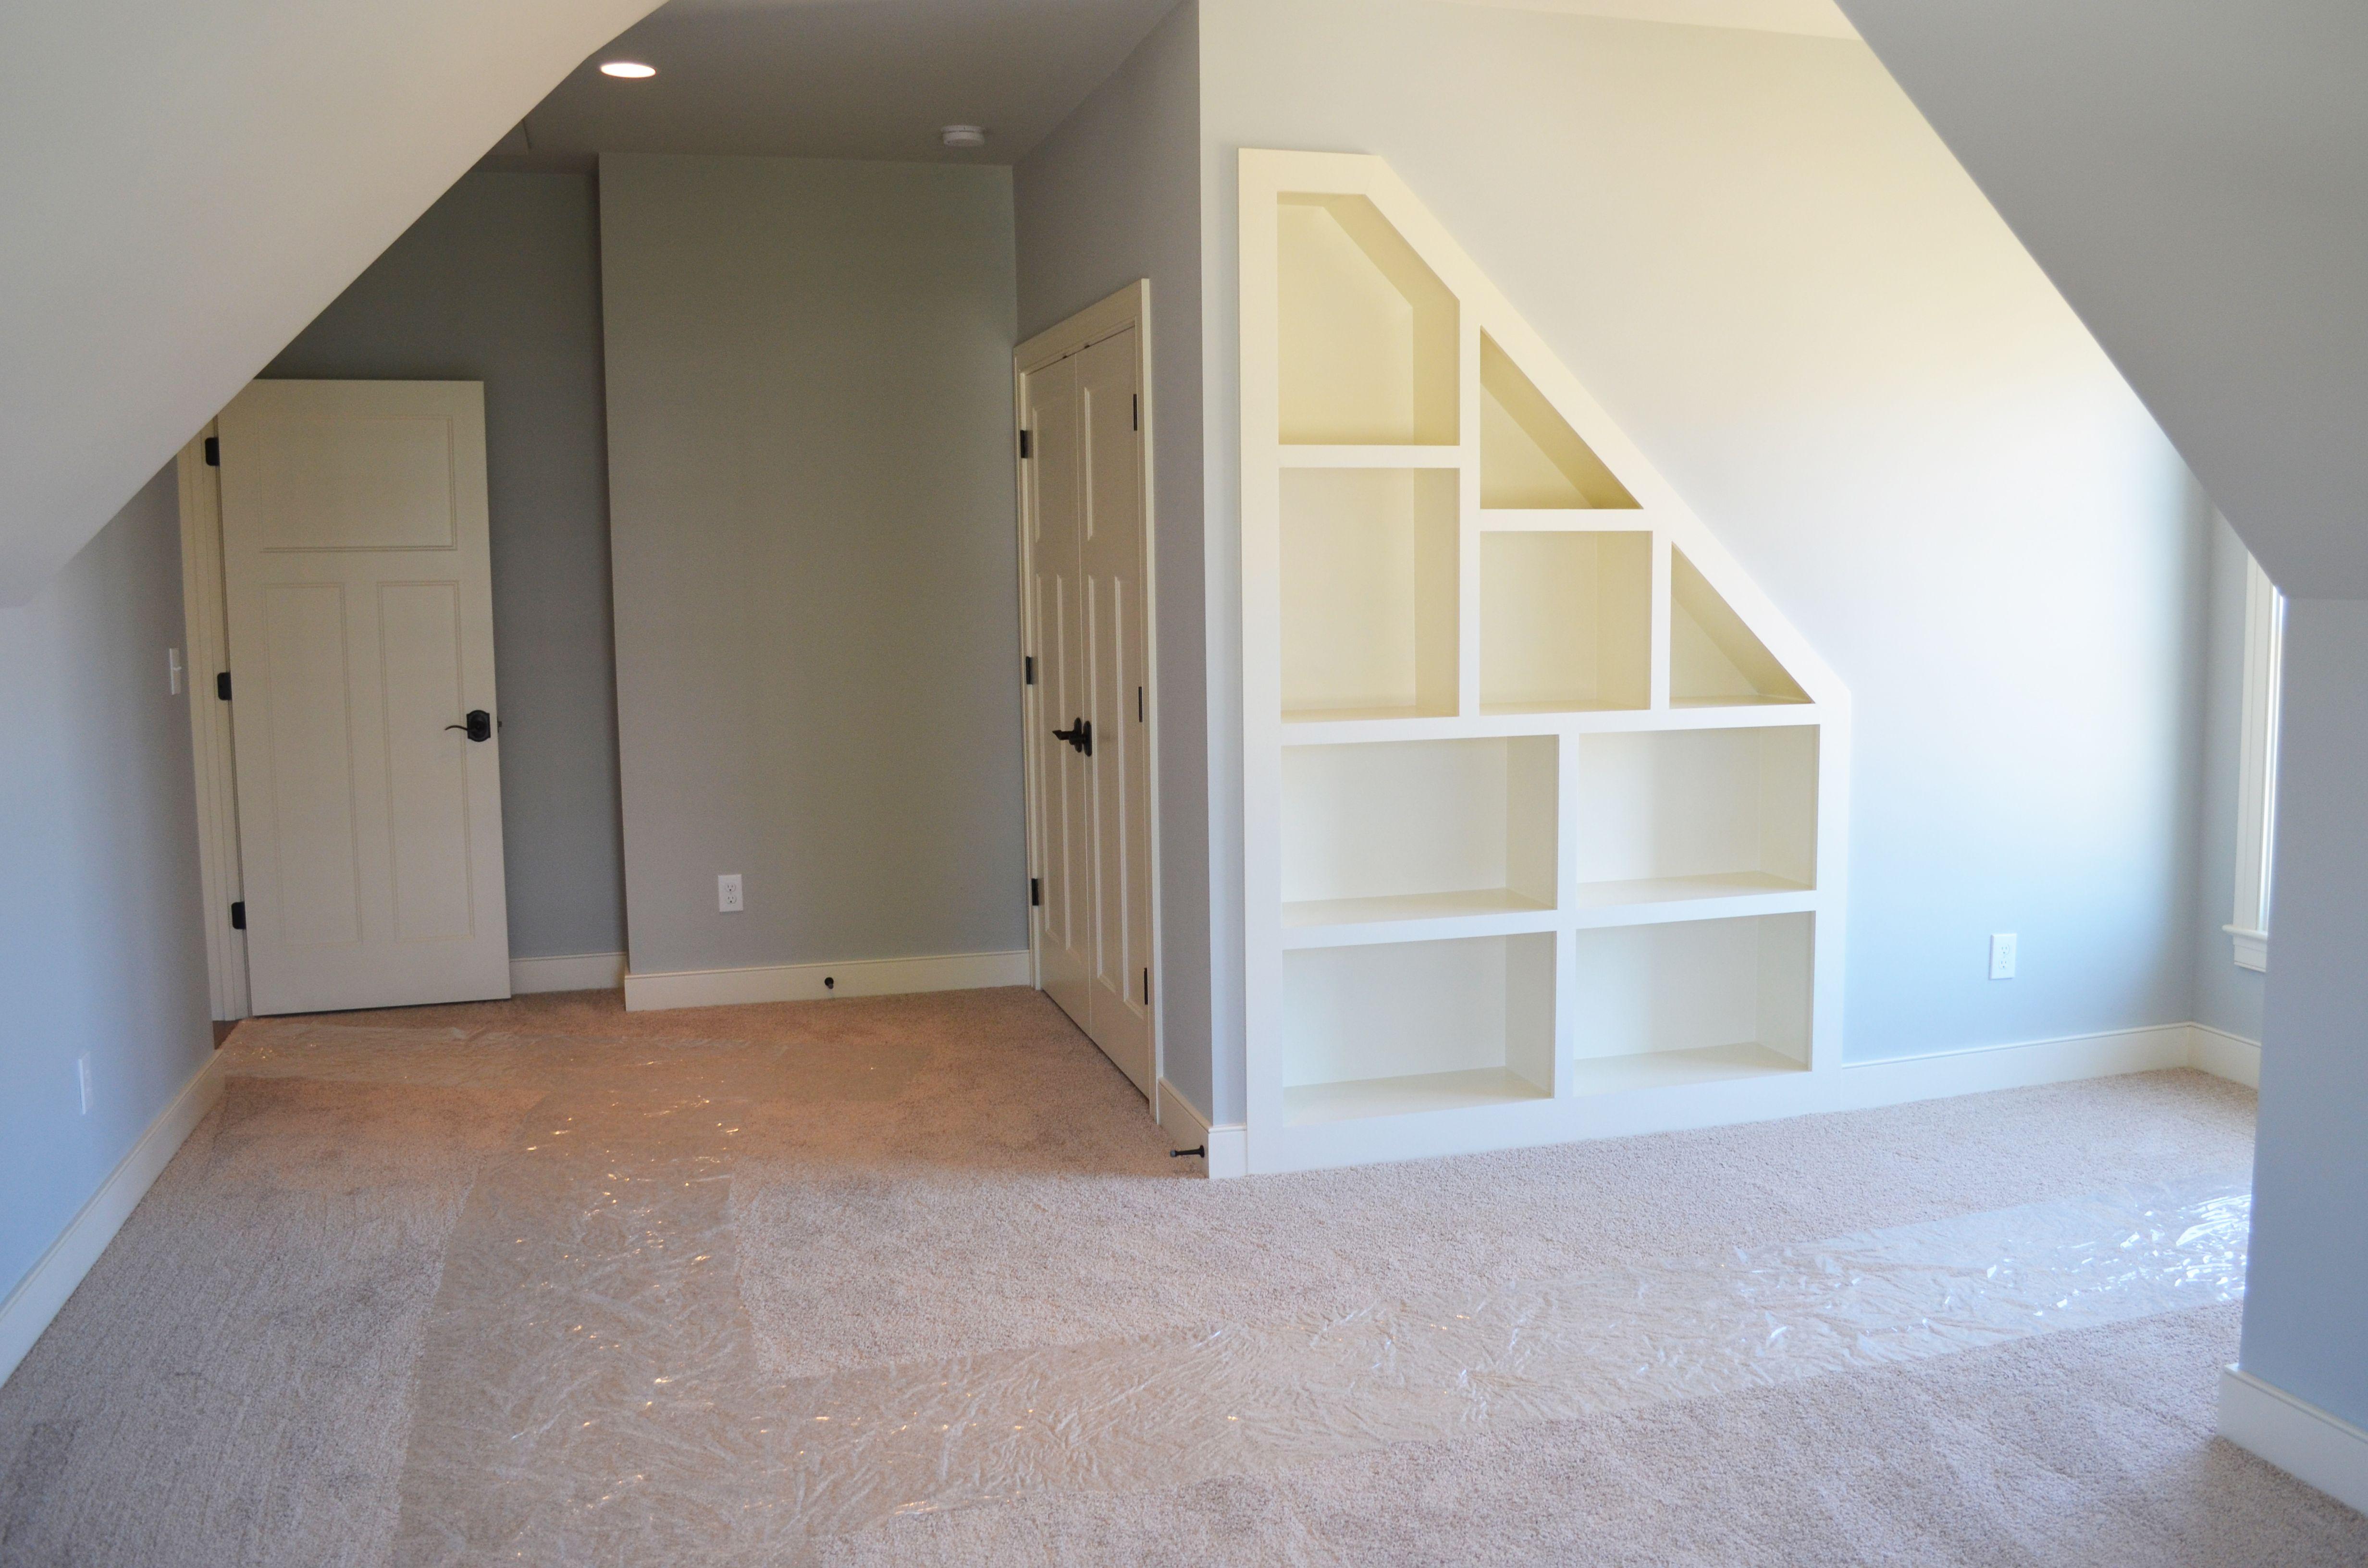 Cubbyhole Storage In Bonus Room One Of The Best